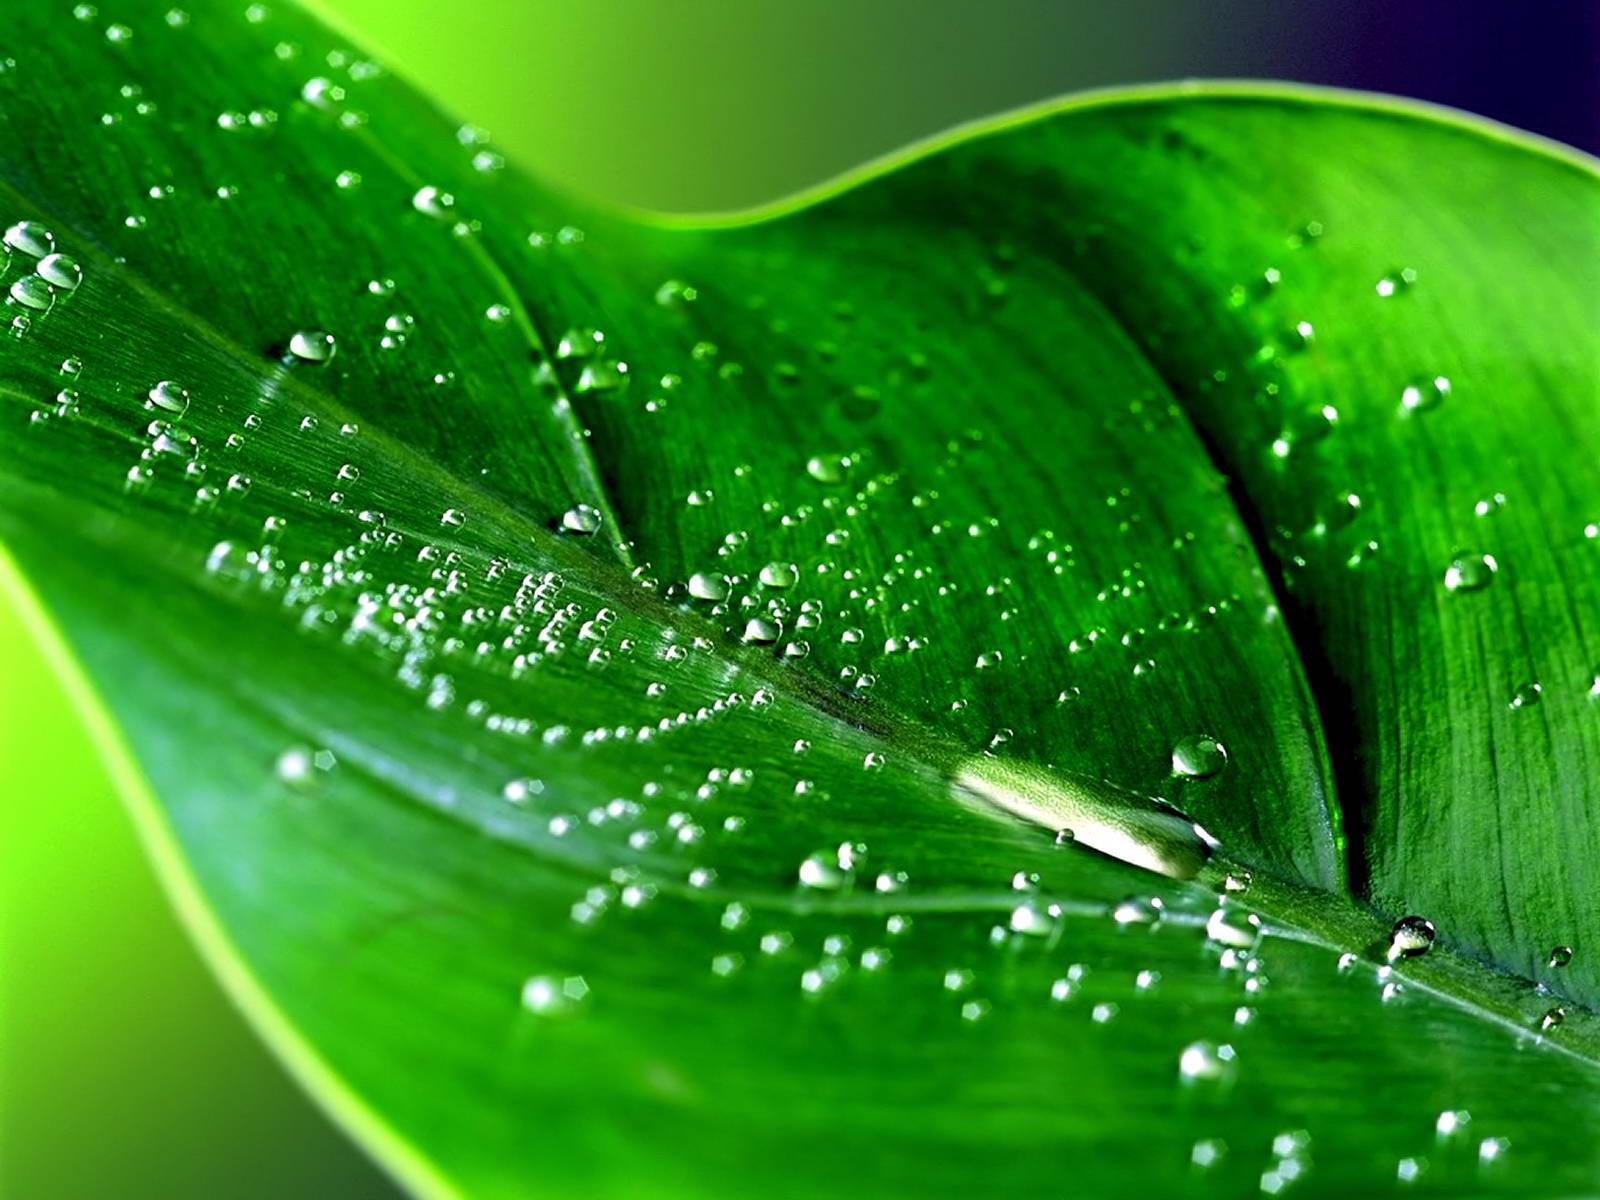 http://1.bp.blogspot.com/-kmS9mJfahwg/TlGCJM46NDI/AAAAAAAAC8M/jeS-vRM4Ywk/s1600/Rain+wallpapers+for+desktop+hd+3.jpg